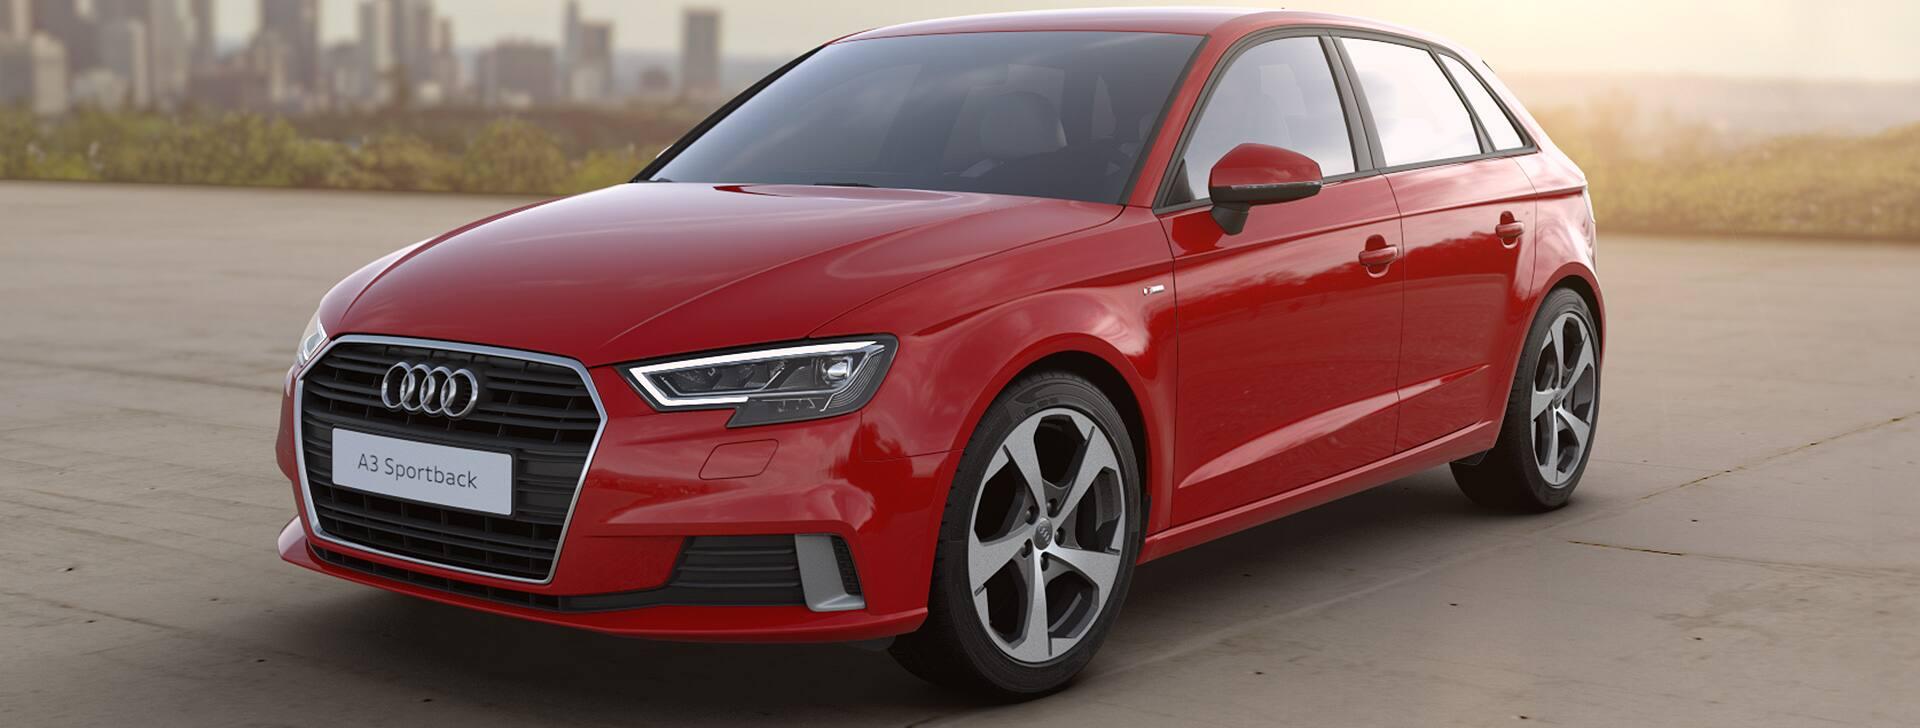 A3 Sportback > A3 > Audi Deutschland